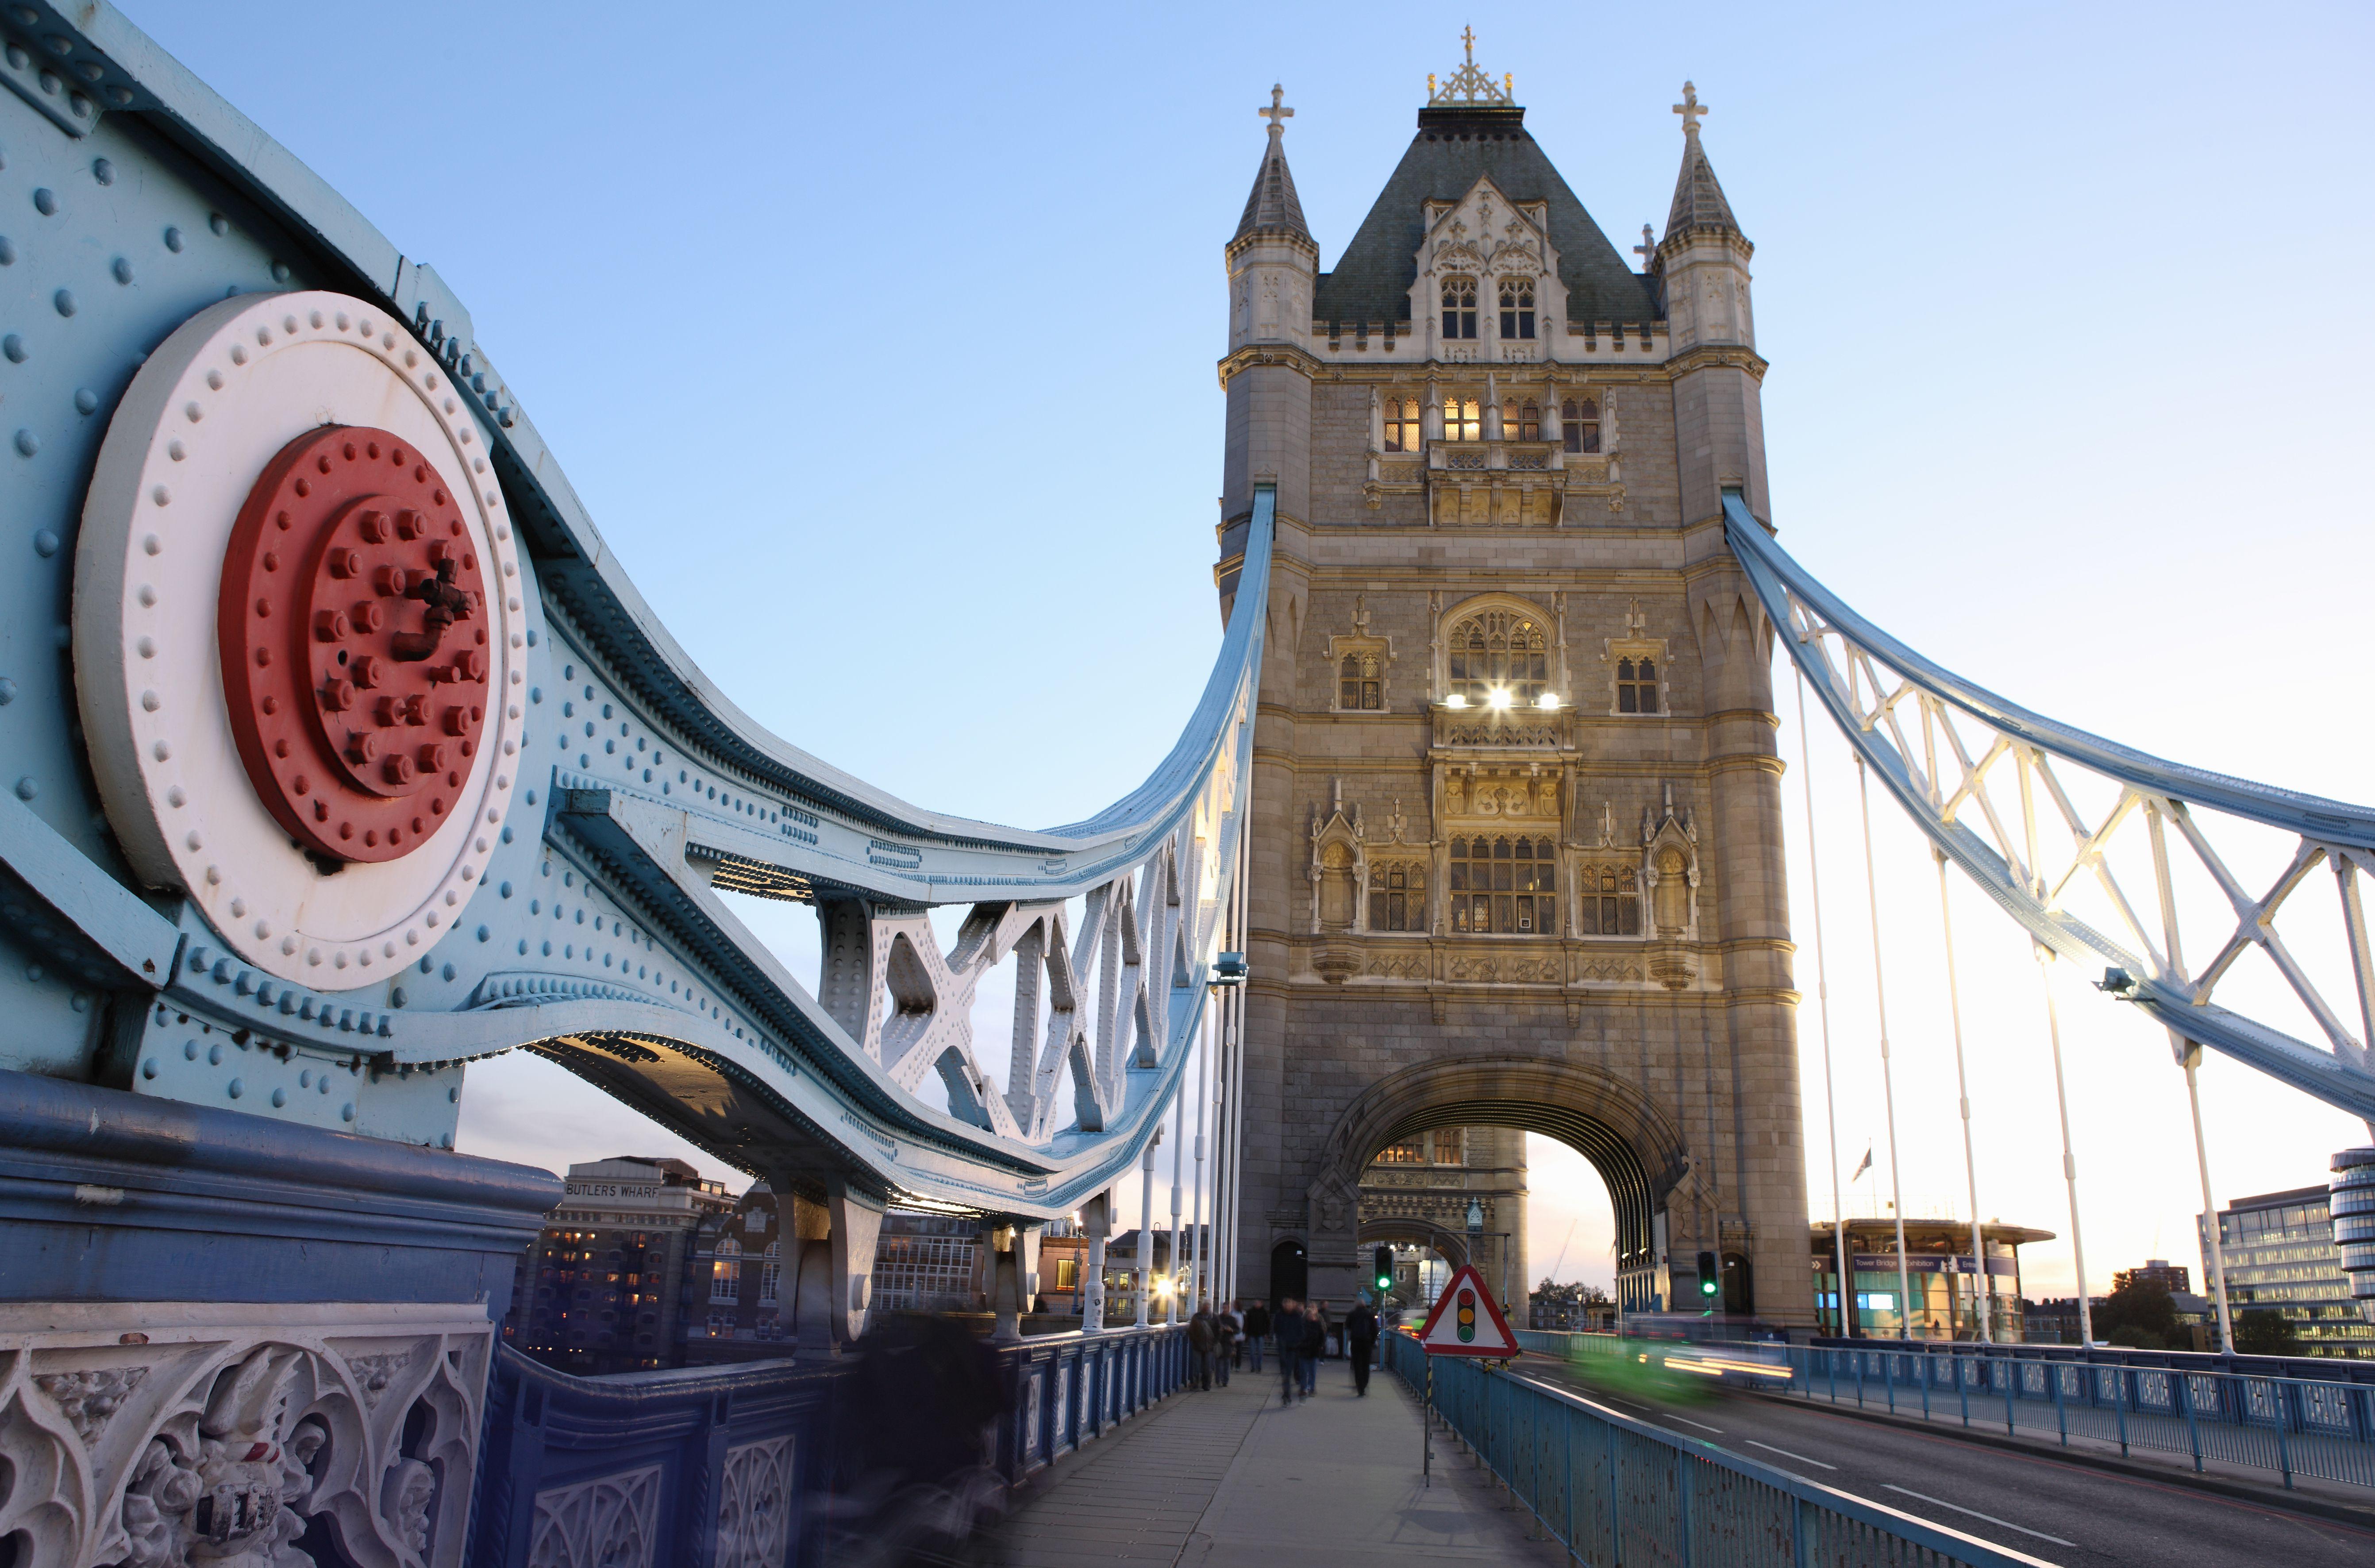 England, London, Tower Bridge Sidewalk, at Dusk